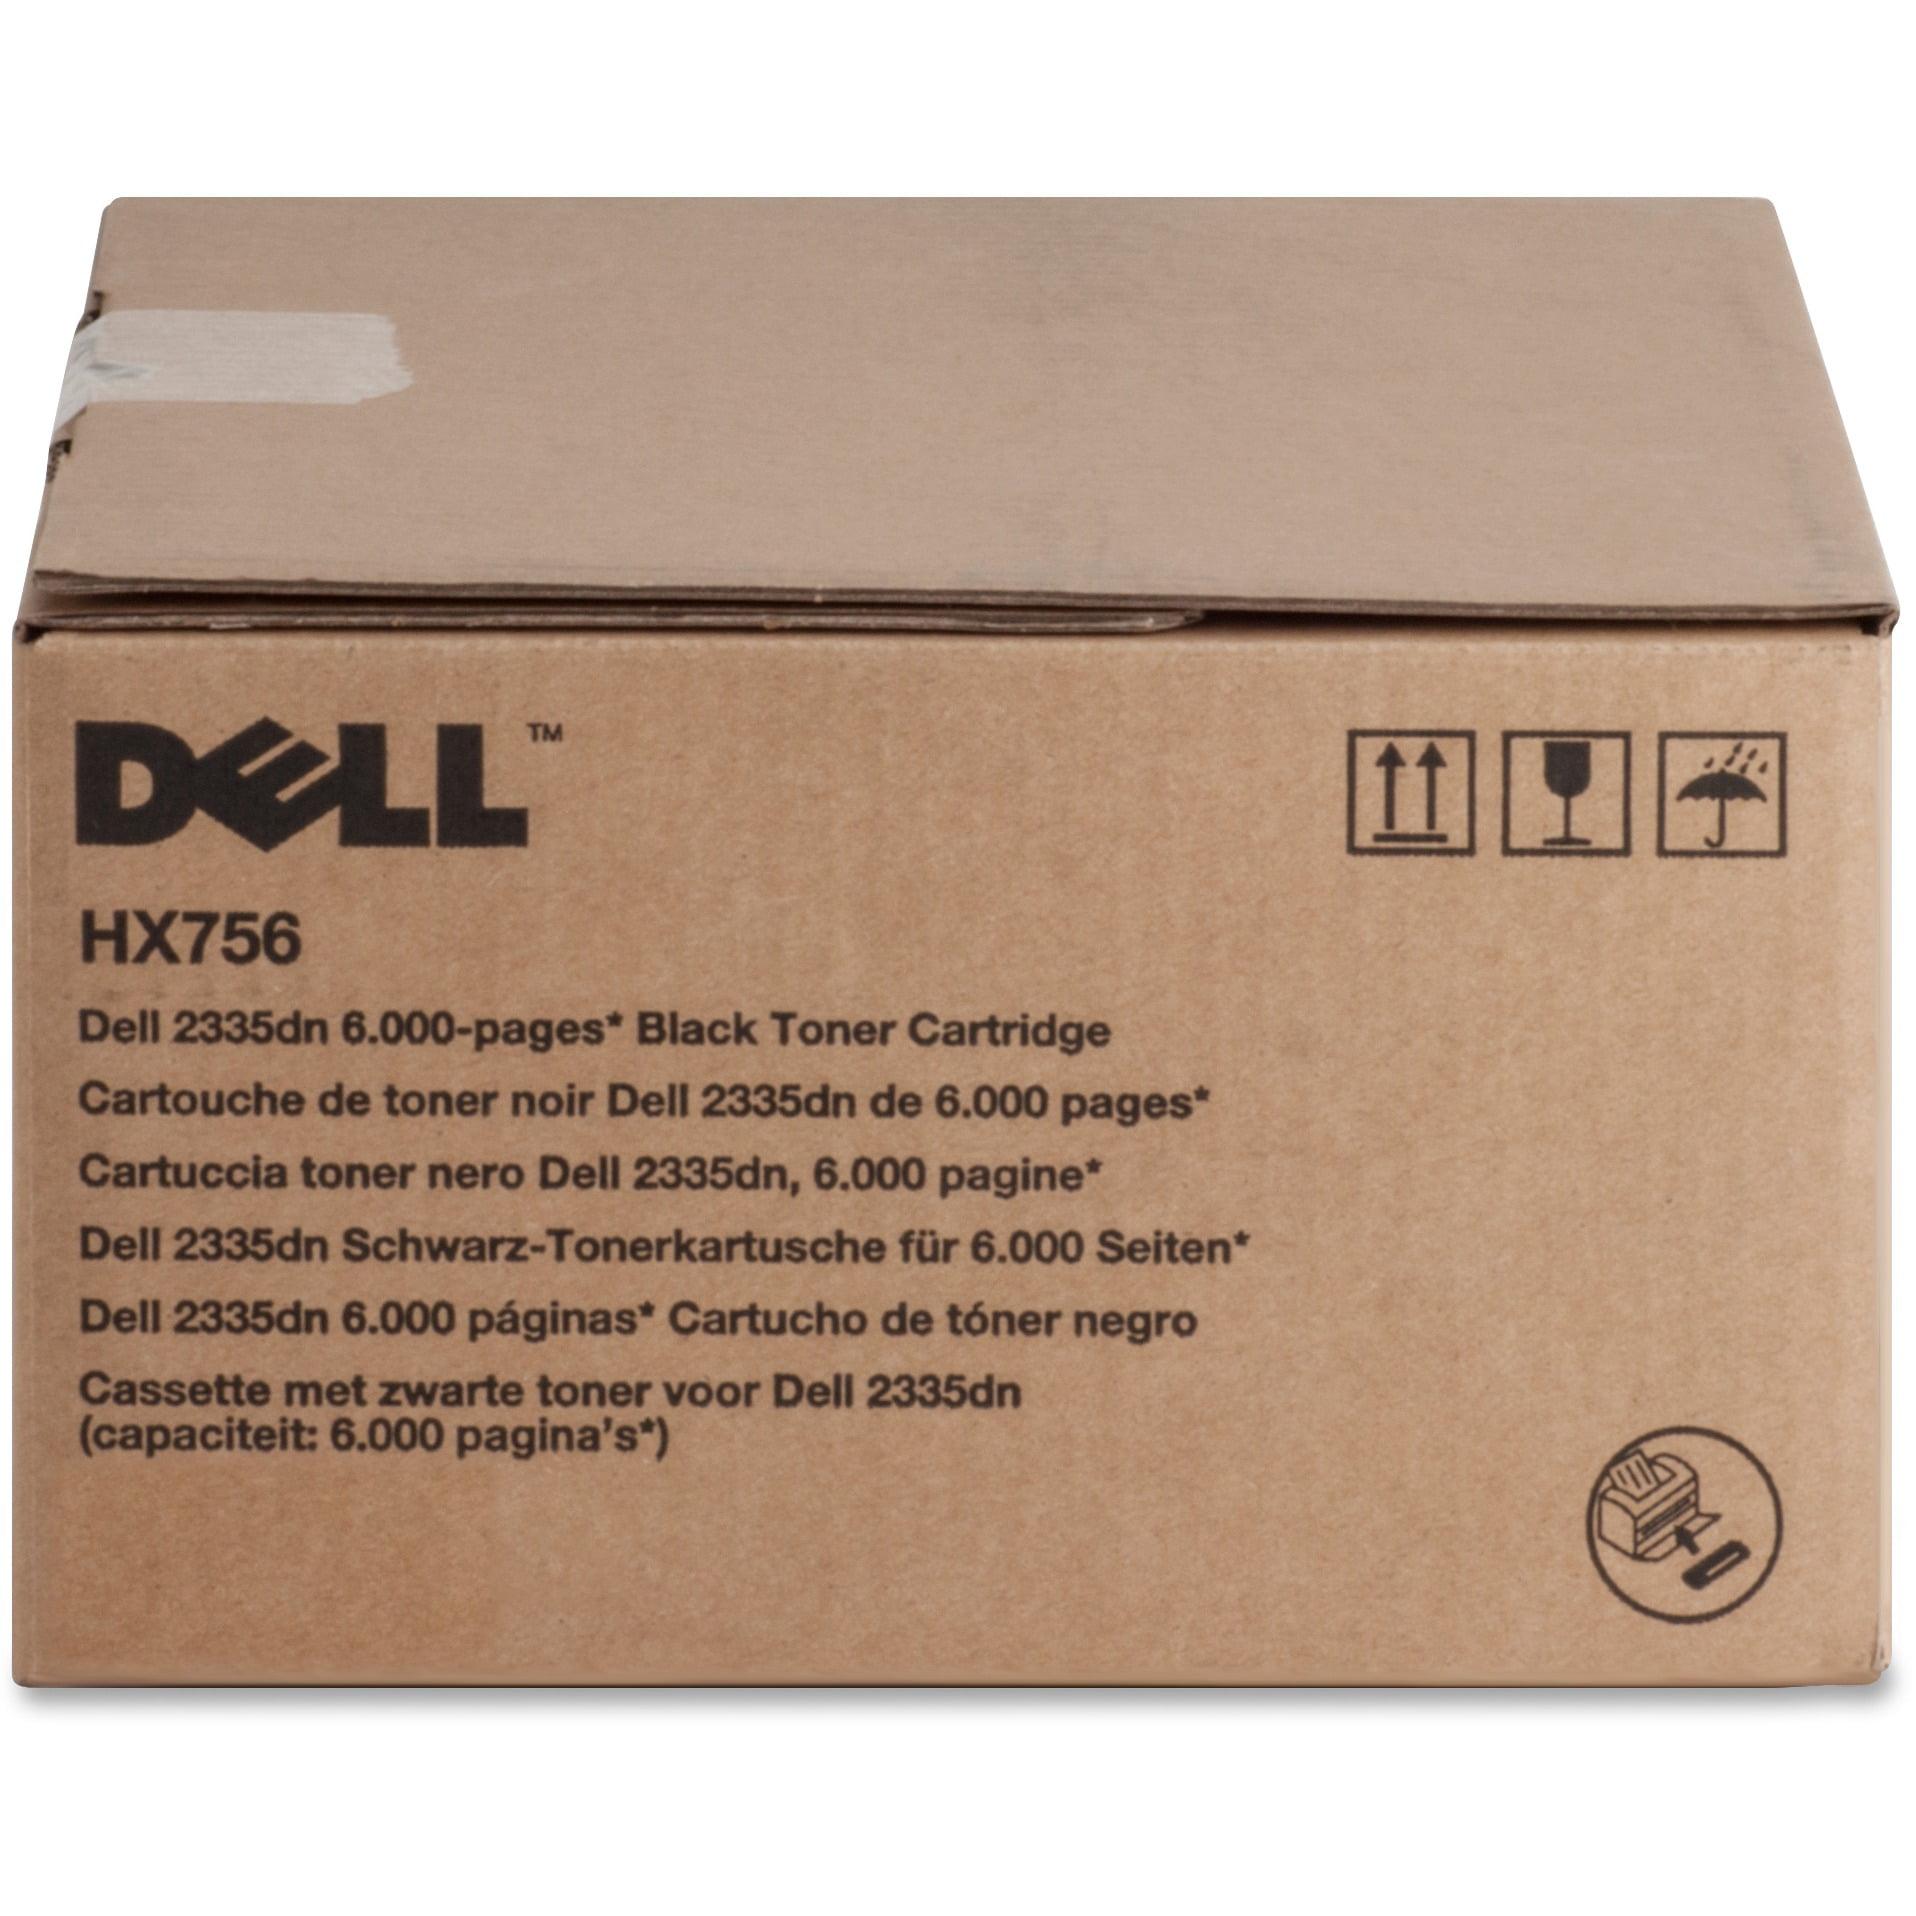 Dell, DLLHX756, 2335dn Toner Cartridge, 1 / Each